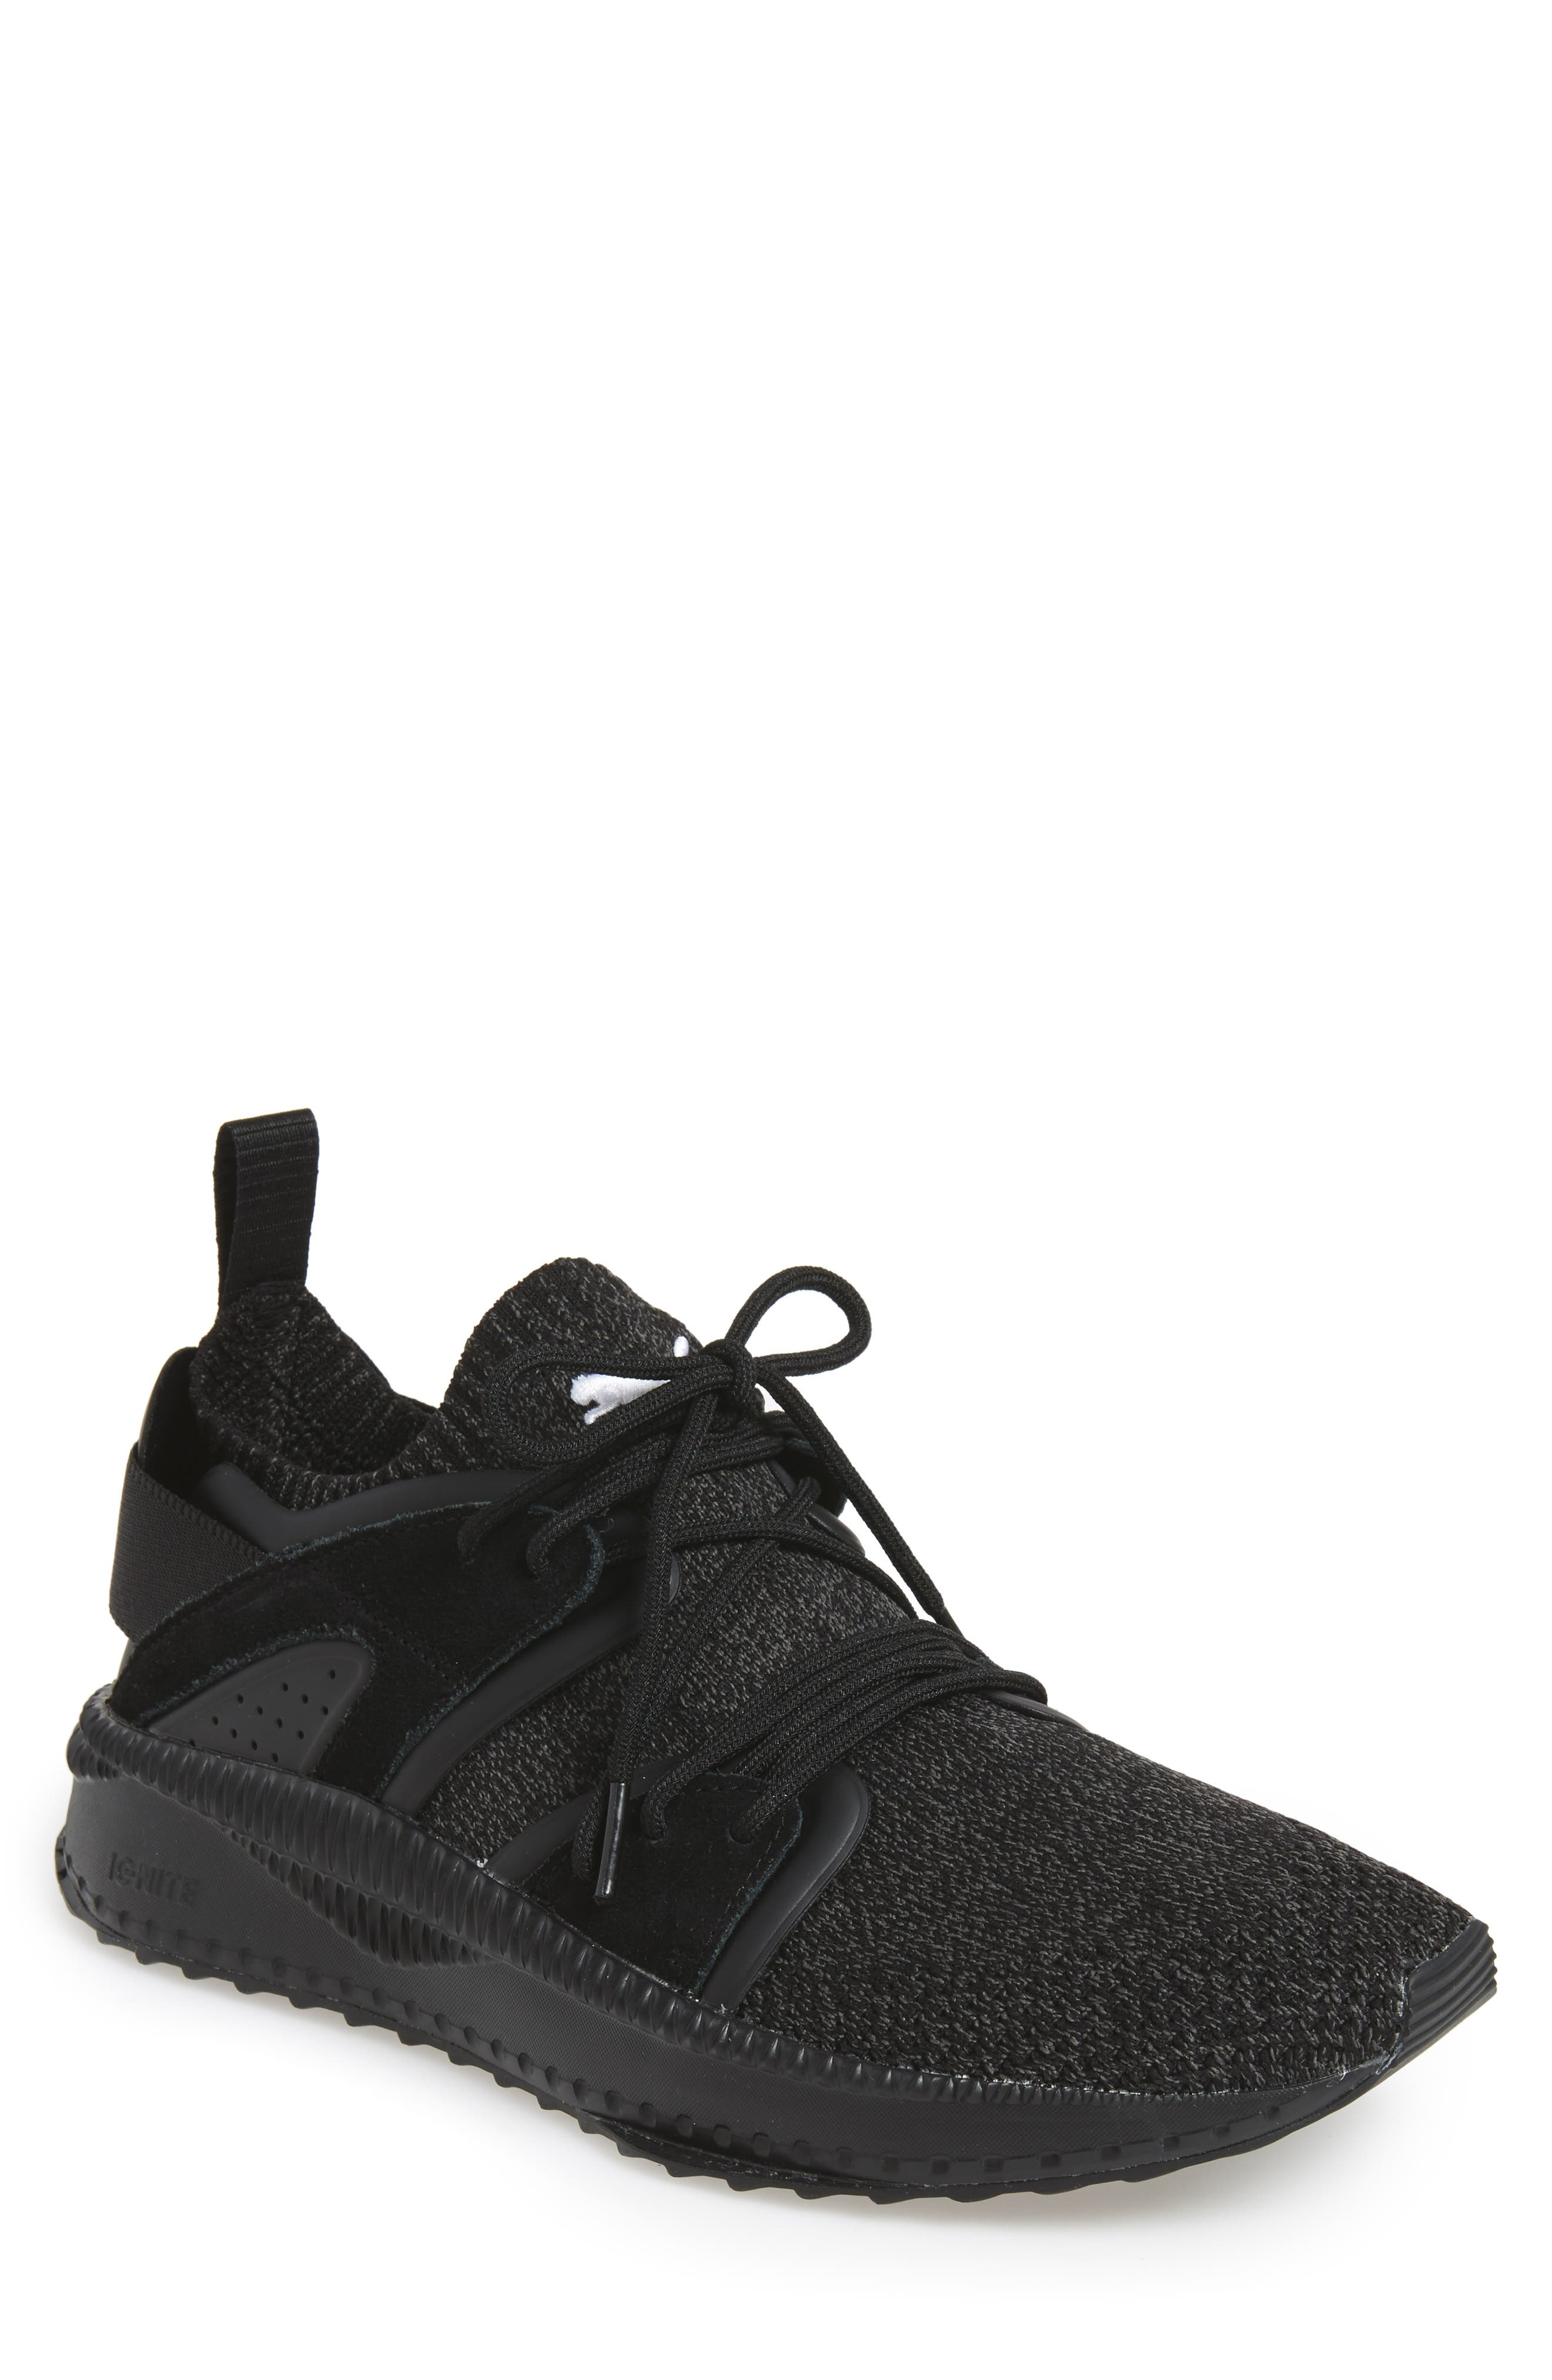 Tsugi Blaze EvoKnit Sneaker,                         Main,                         color, 001